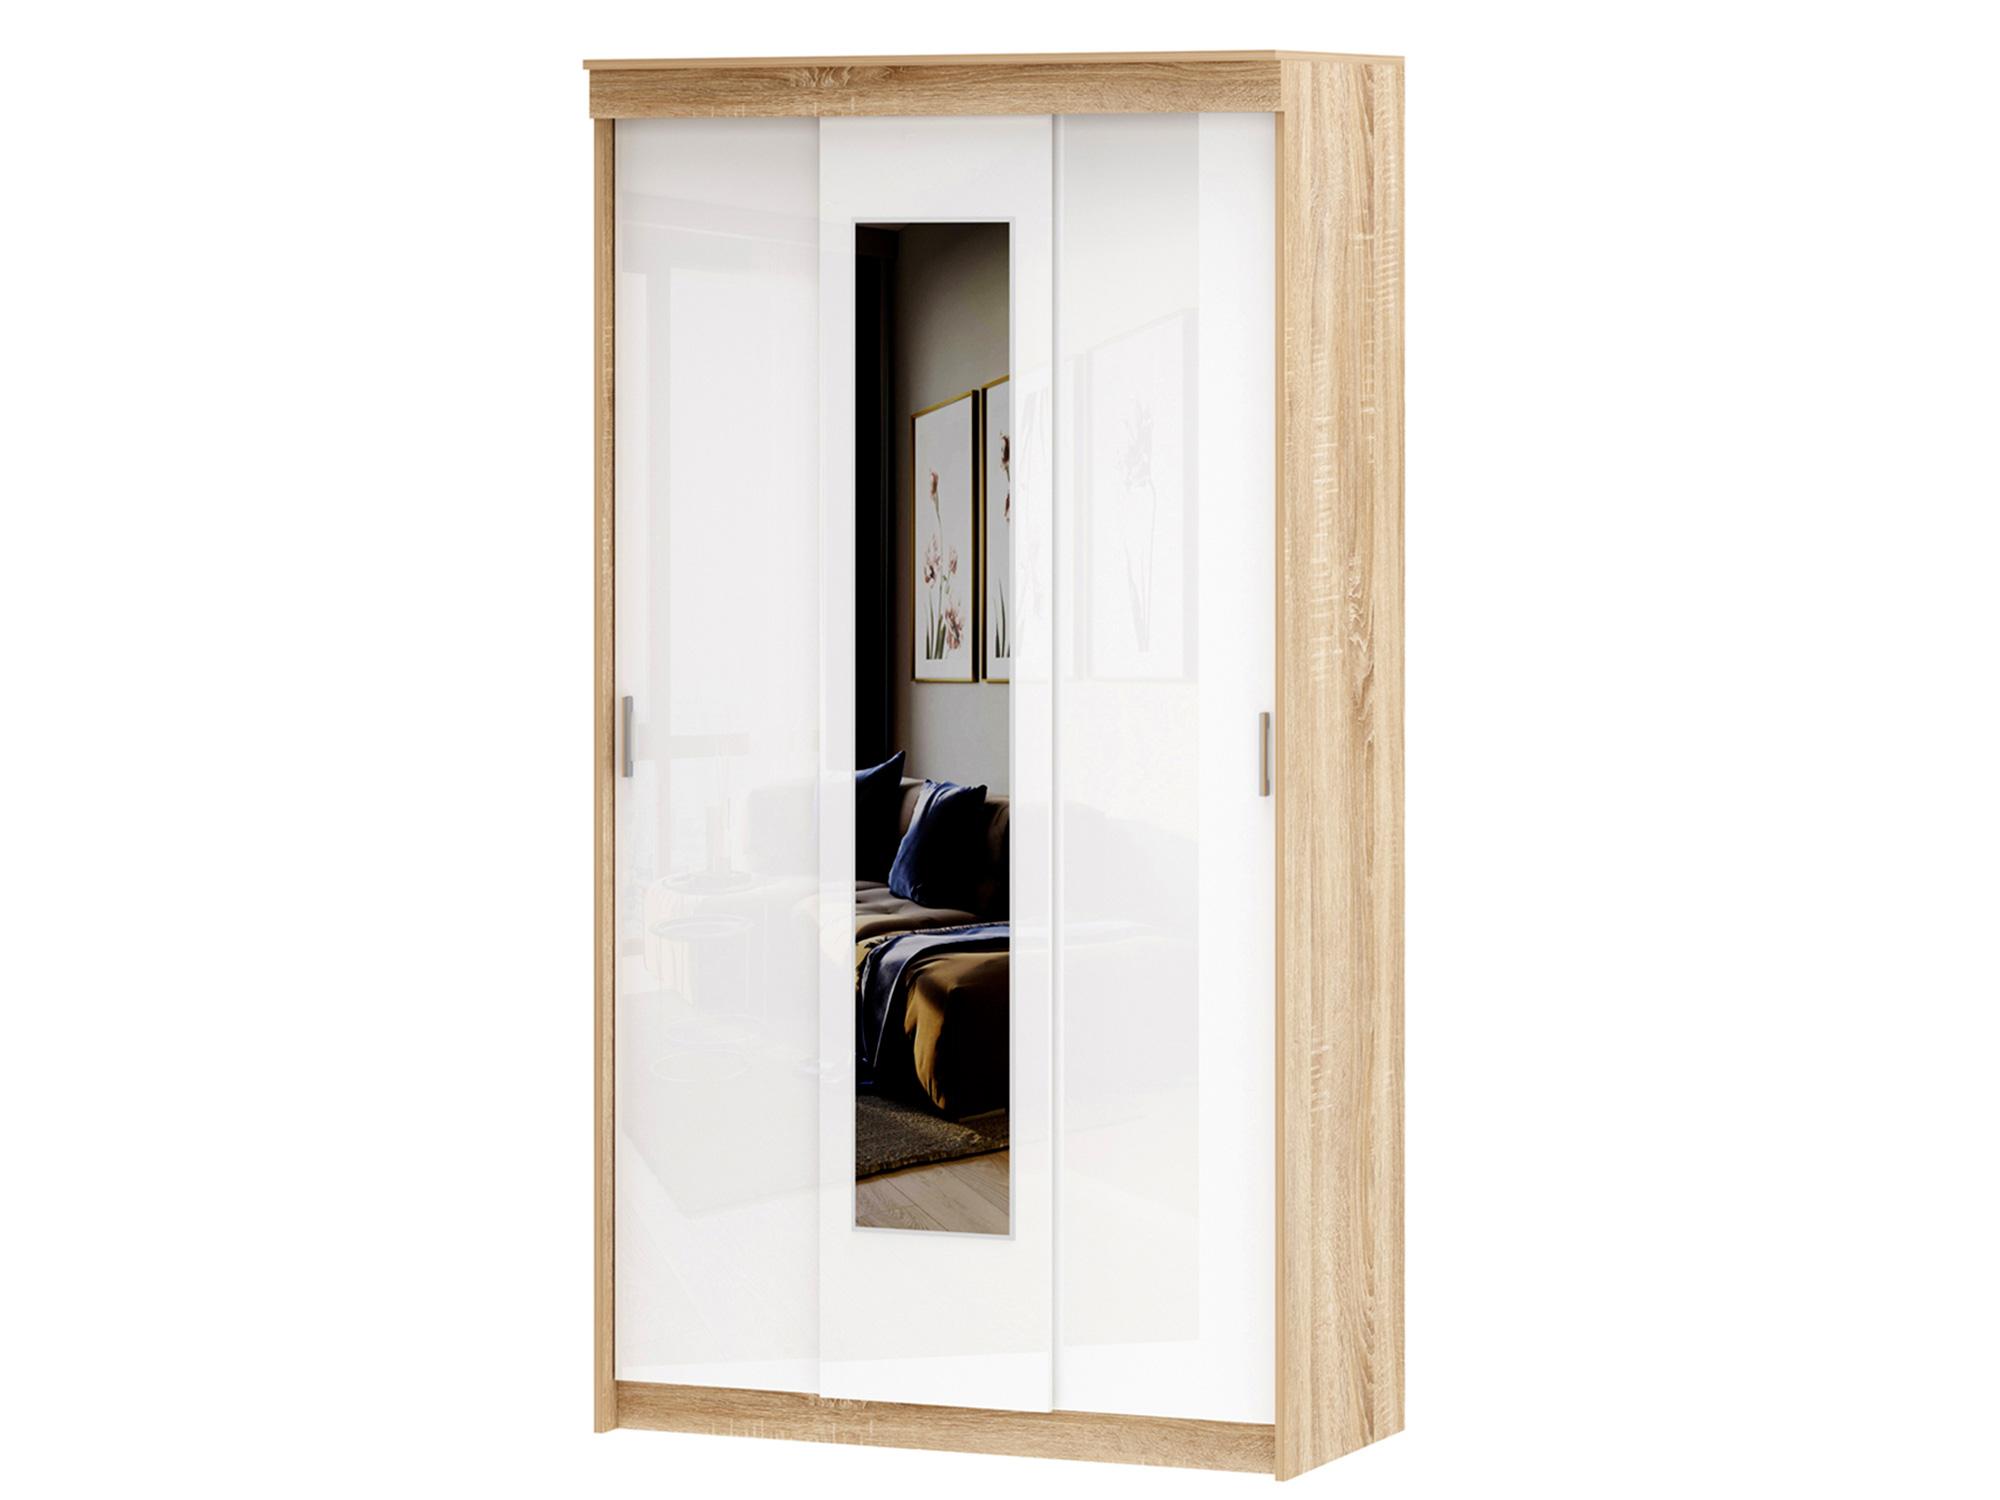 Шкаф-купе 3-х дверный Беатрис Бежевый, Белый, Белый глянец